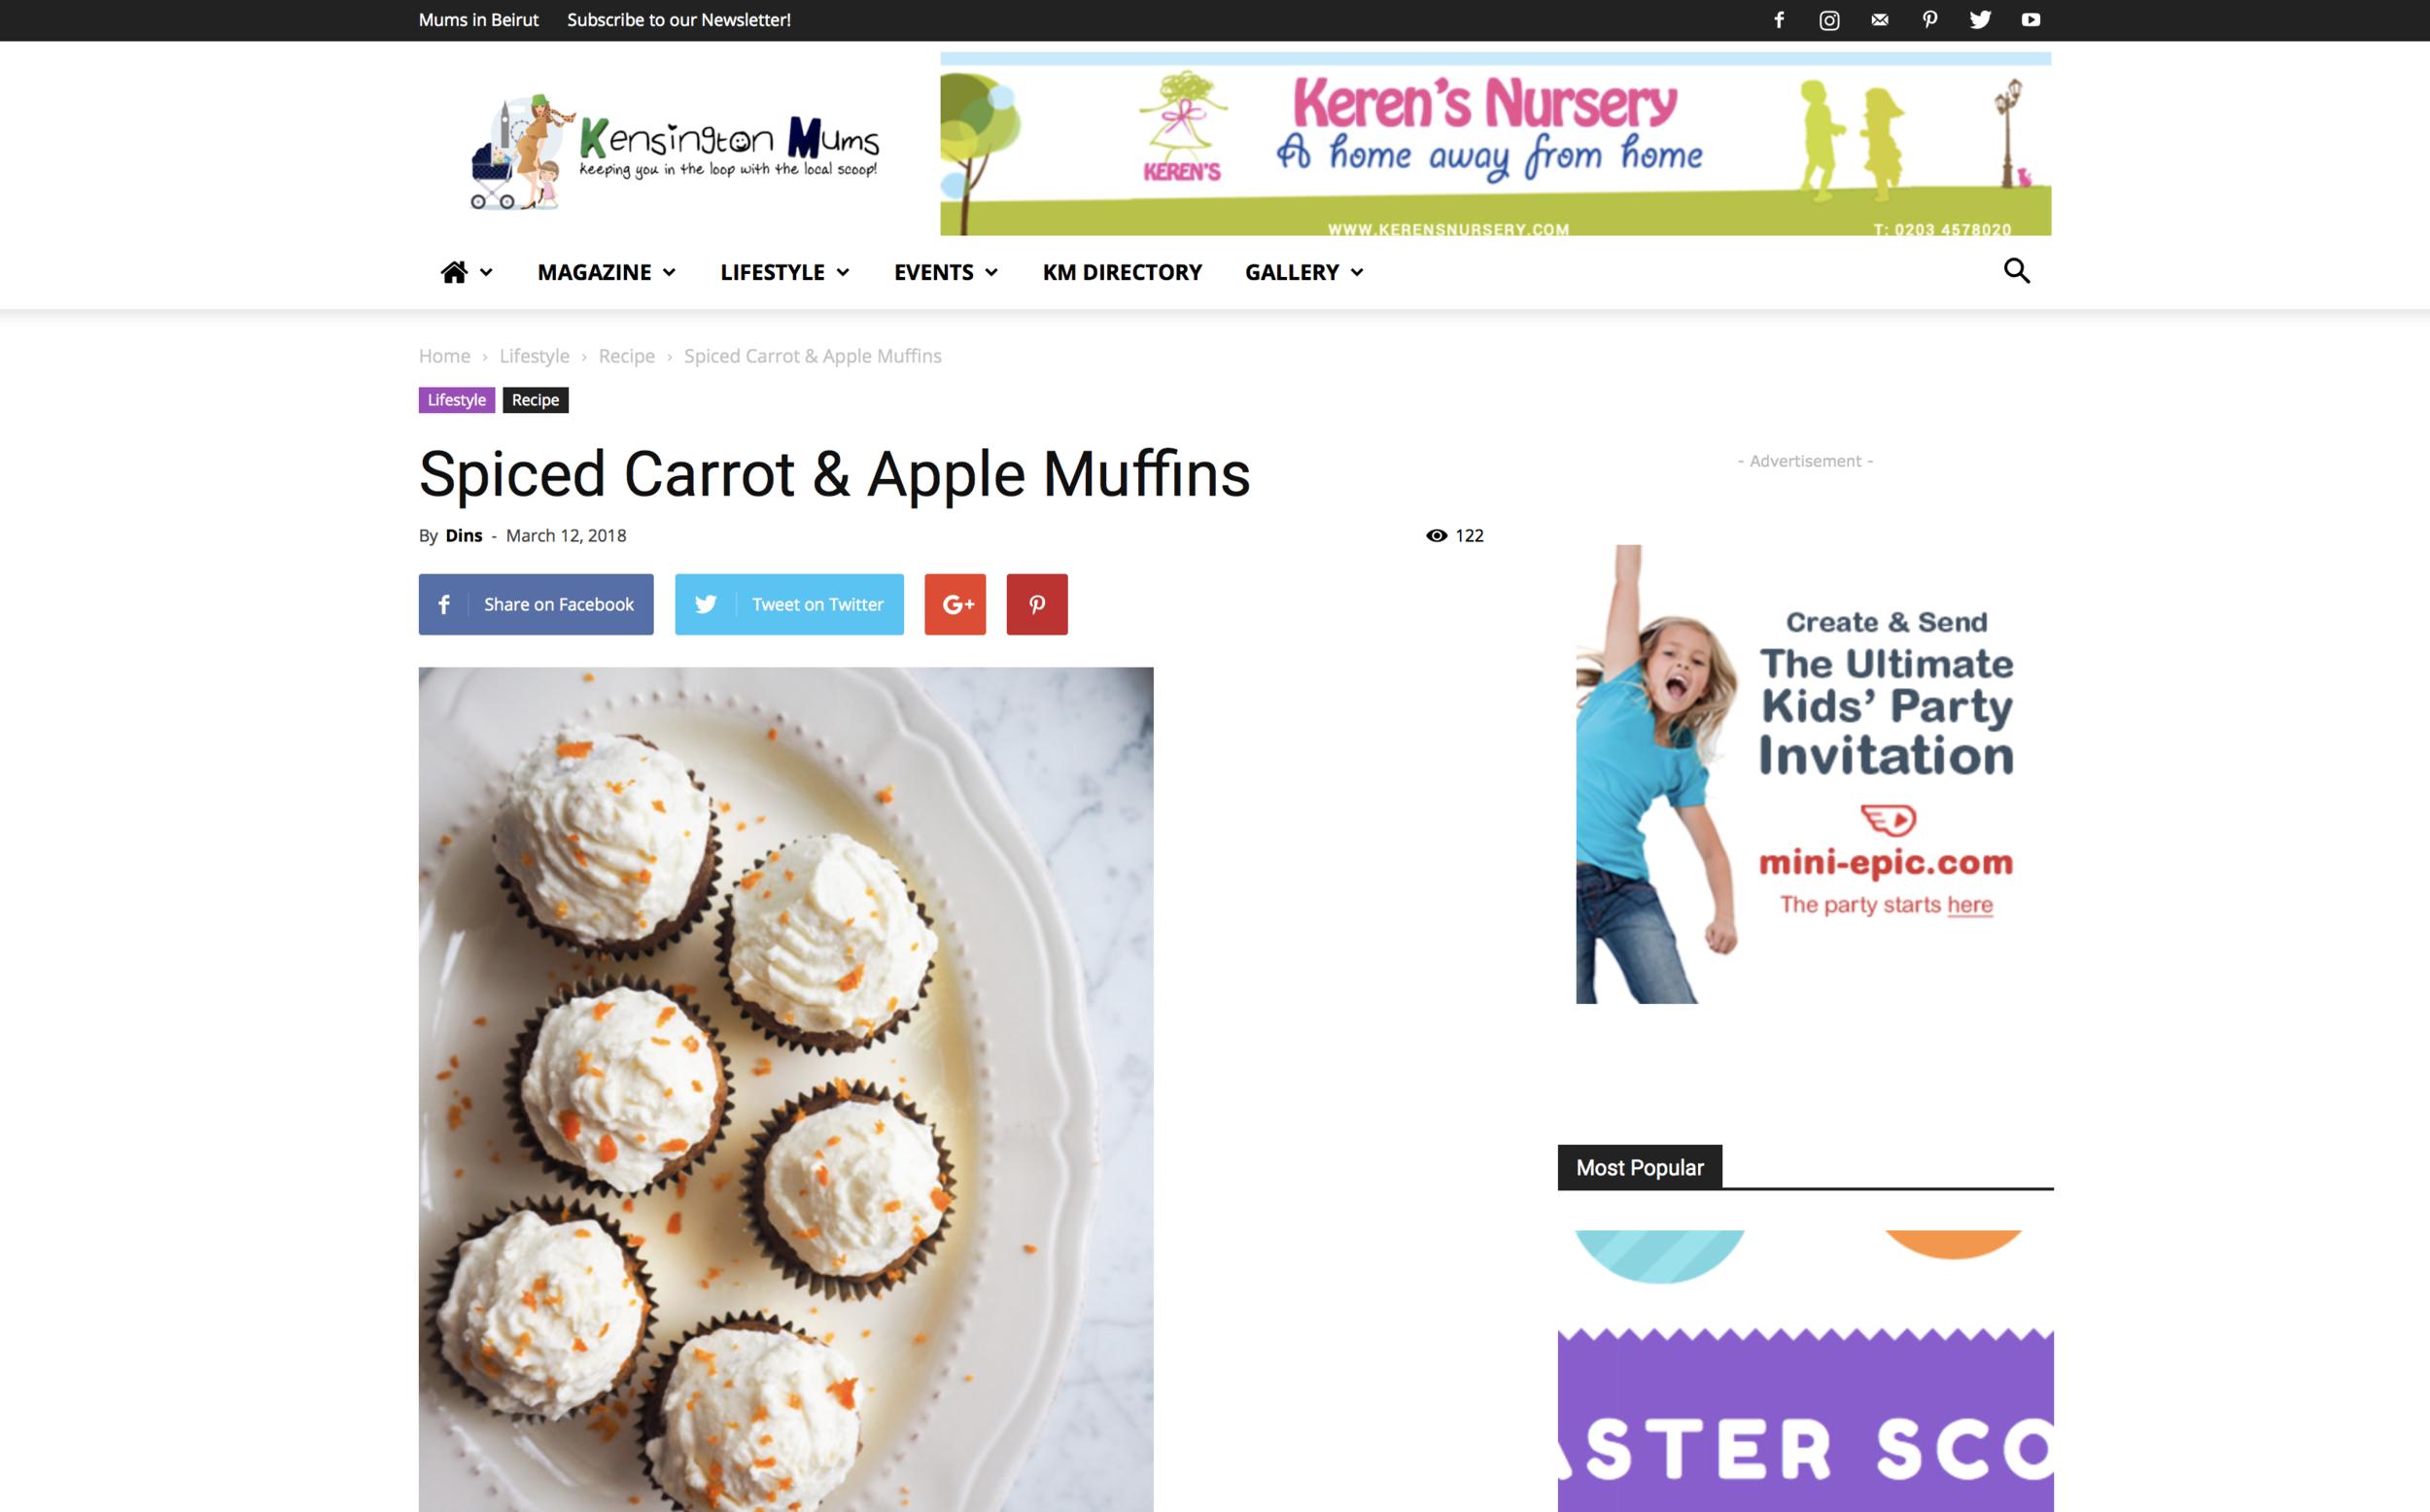 Kensington Mums Recipe Share 16.03.18 1 of 4.png